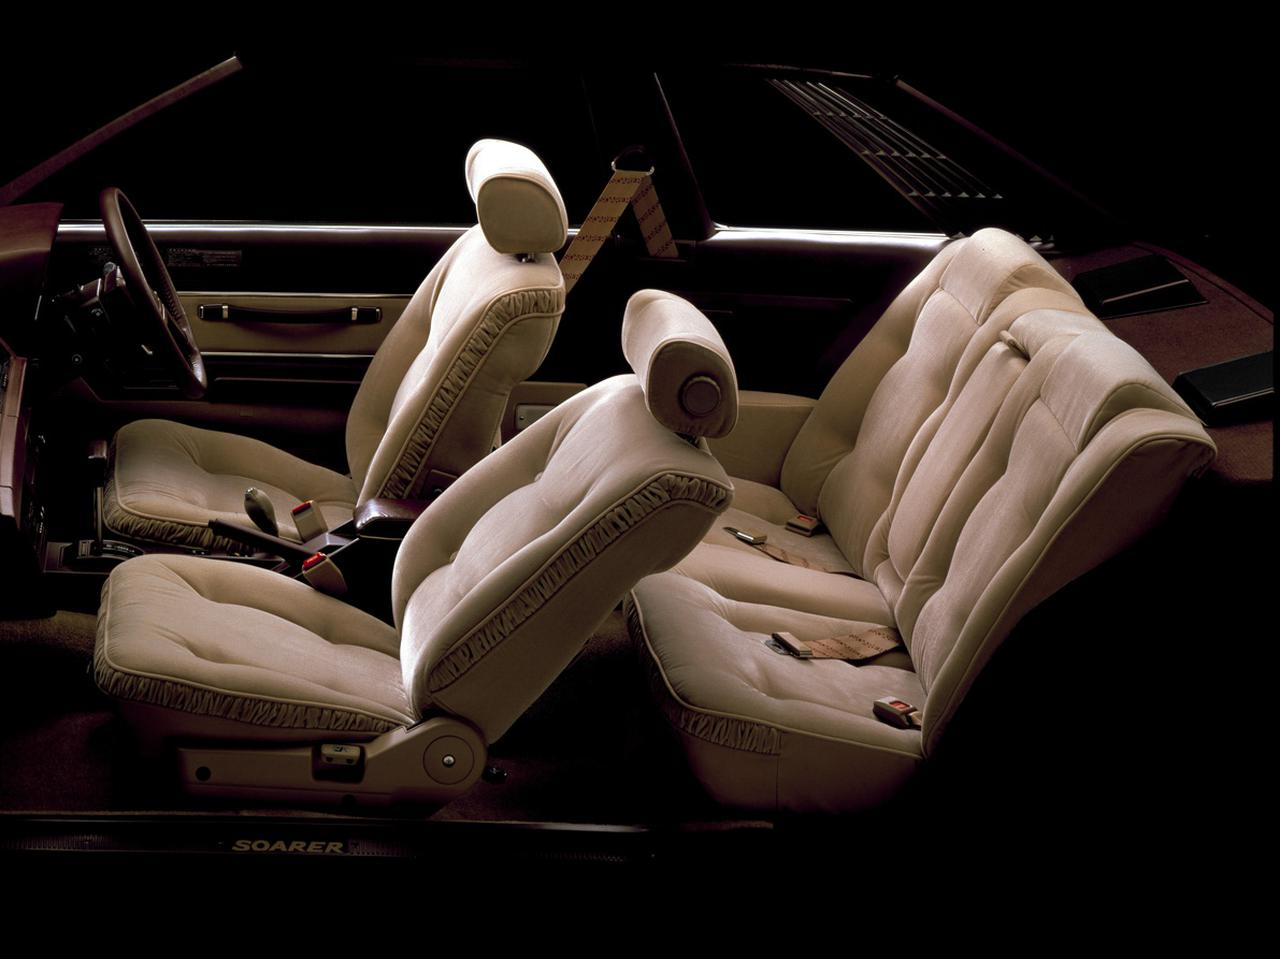 Images : 6番目の画像 - 新時代を切り拓いた初代ソアラと5M-GEU型エンジン - LAWRENCE - Motorcycle x Cars + α = Your Life.